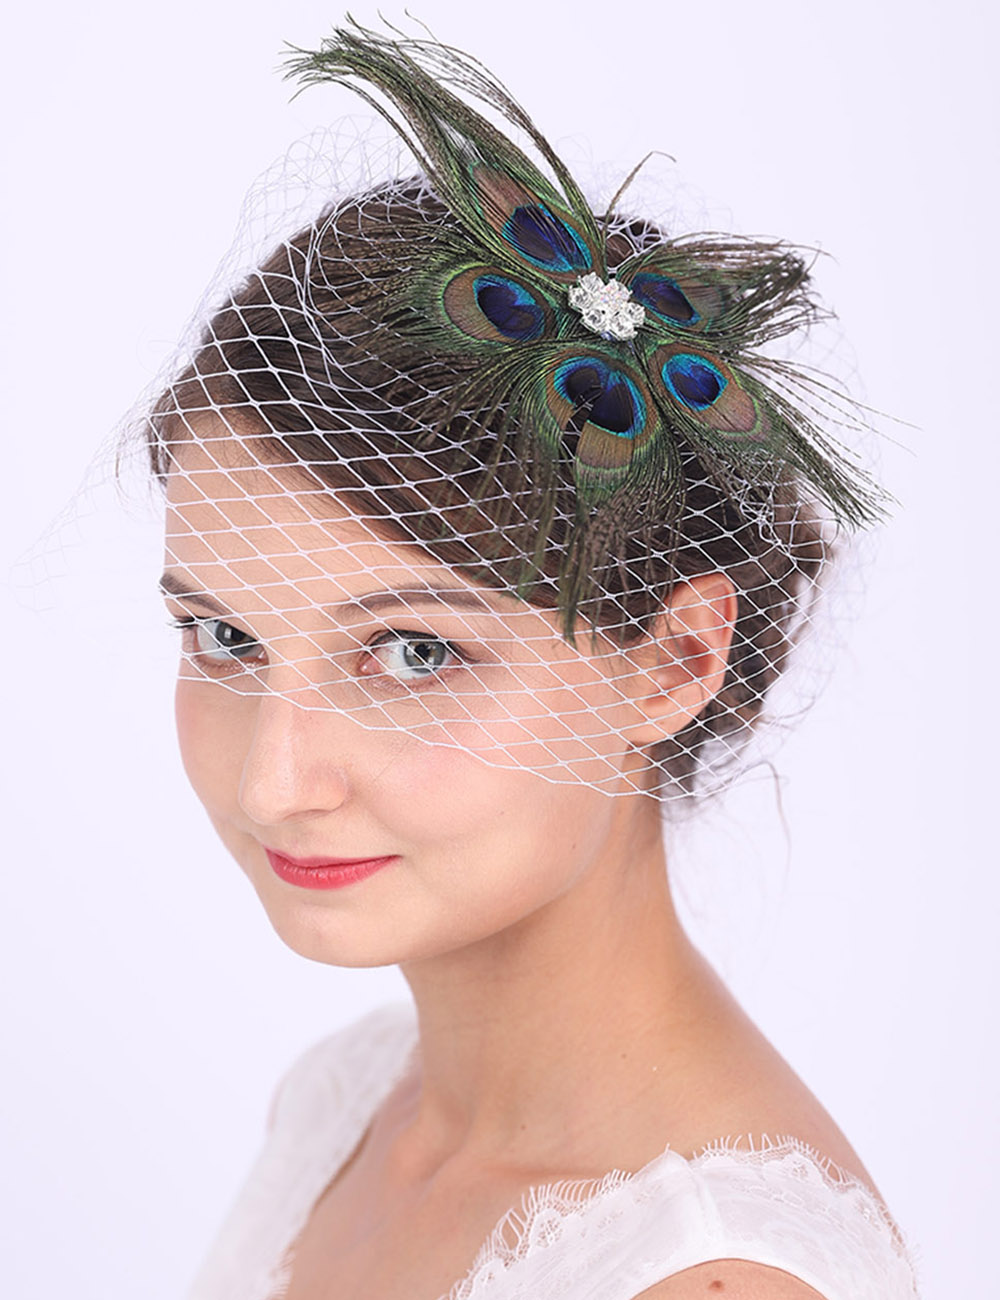 bridal headpiece bird cage bride vintage veil feathers velvet bow elegant fascinator wedding bridesmaids ivory black customisable coque